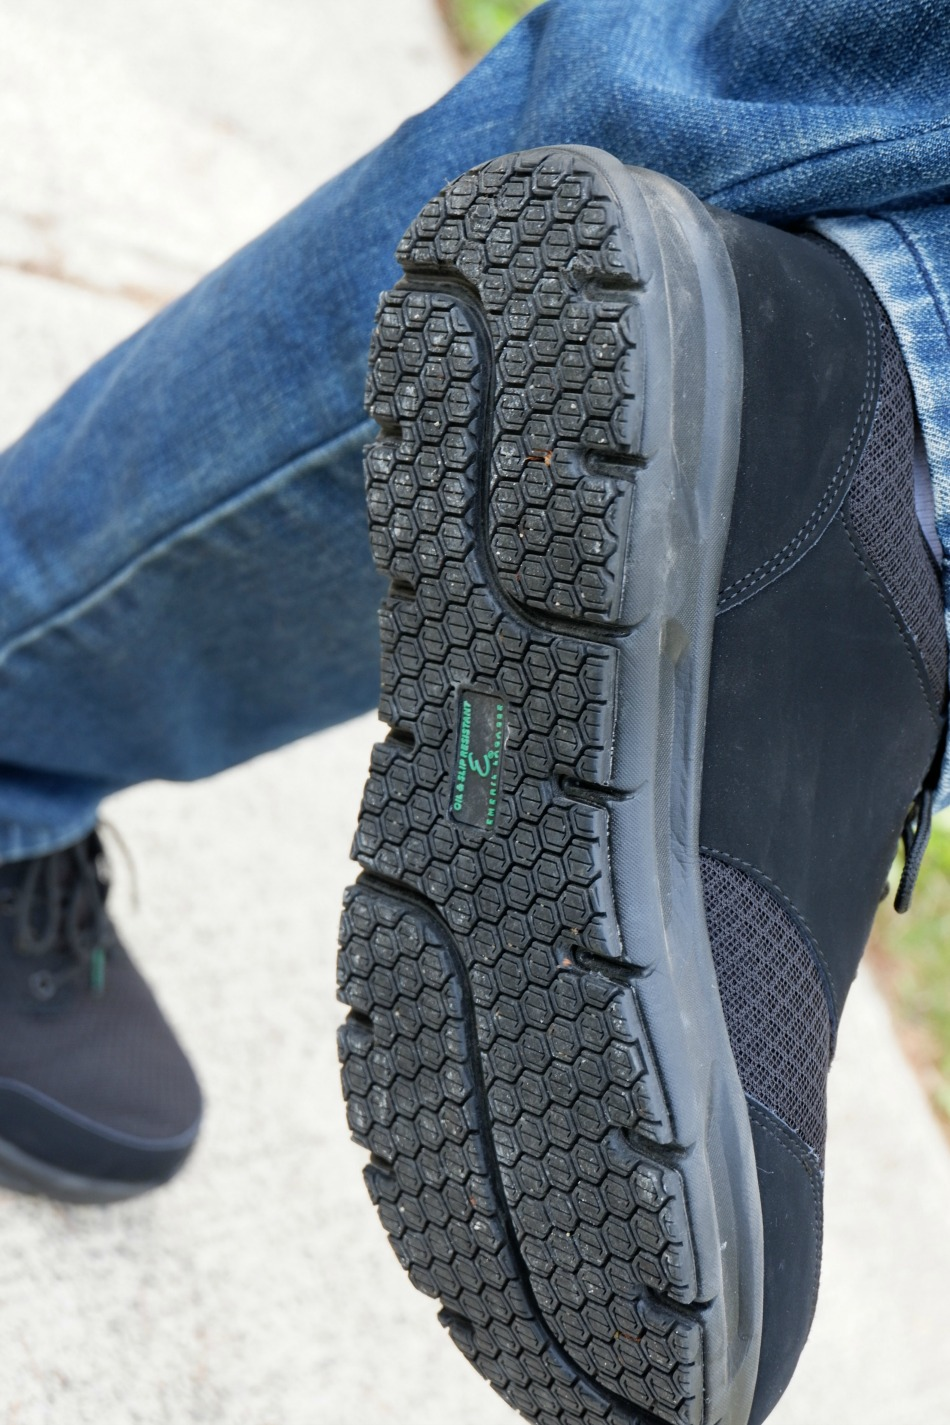 slip resistant shoes from Emeril's Footwear